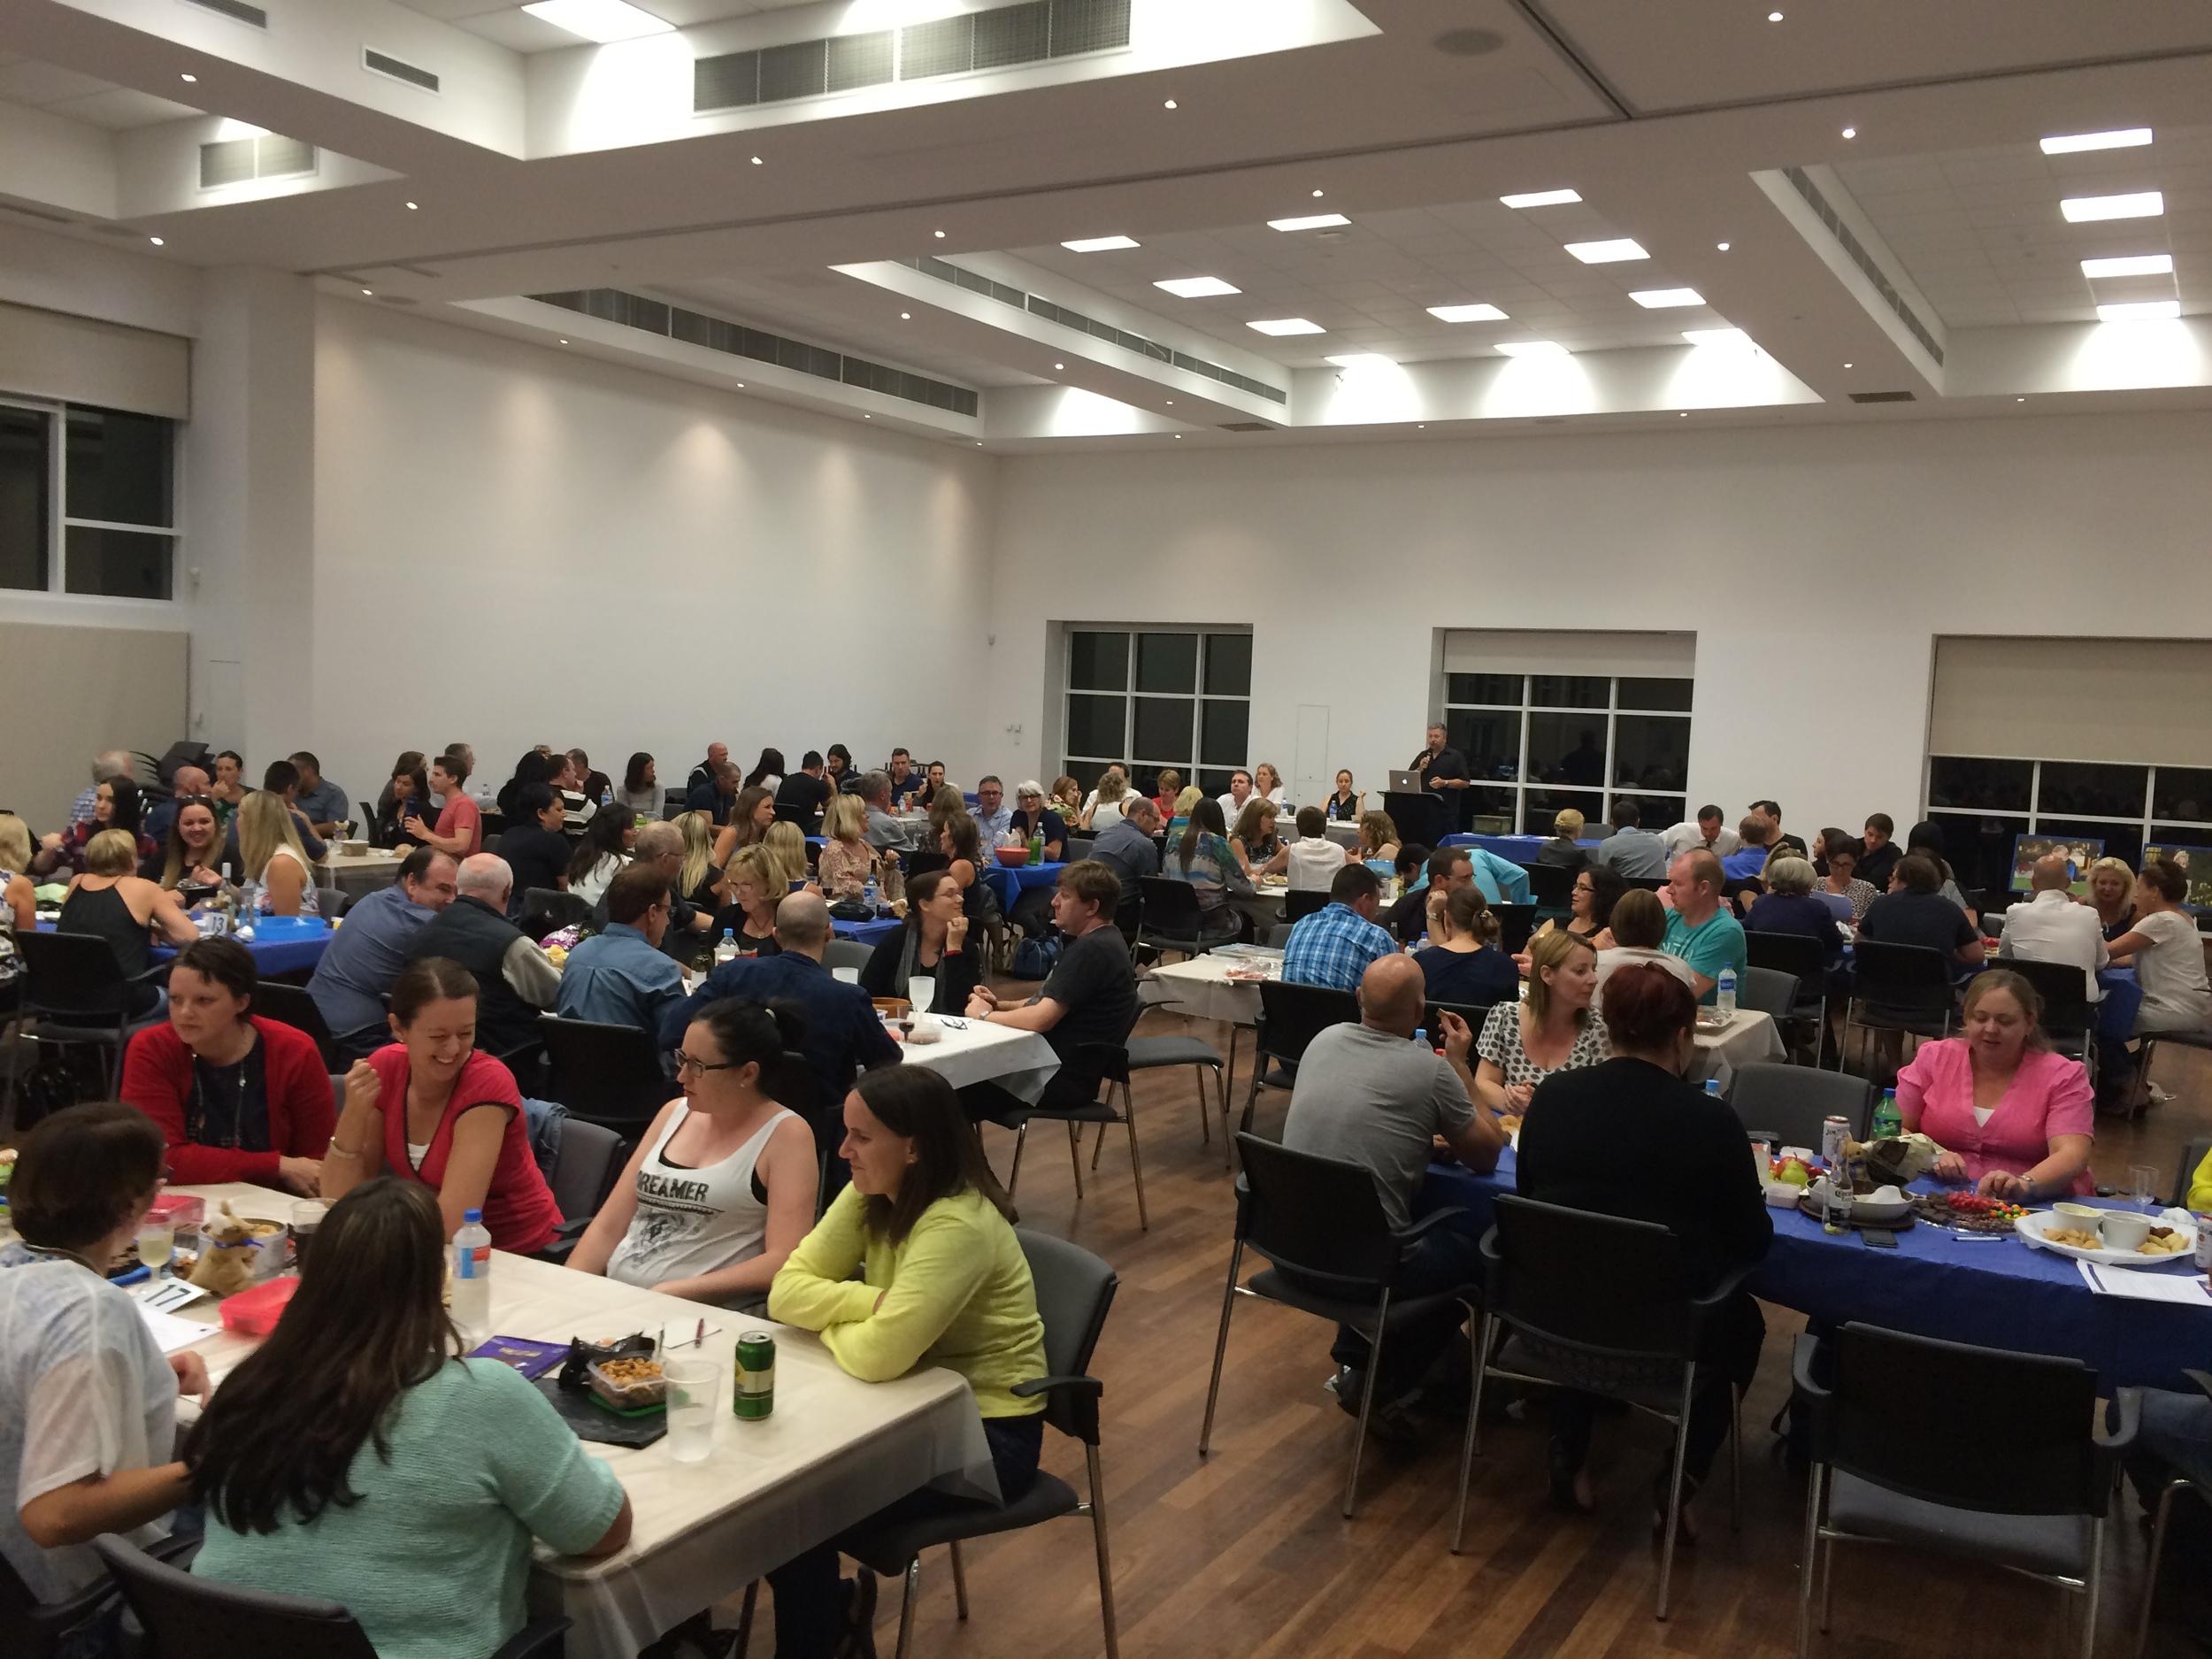 Quiz Night underway at the South Perth Community Hall